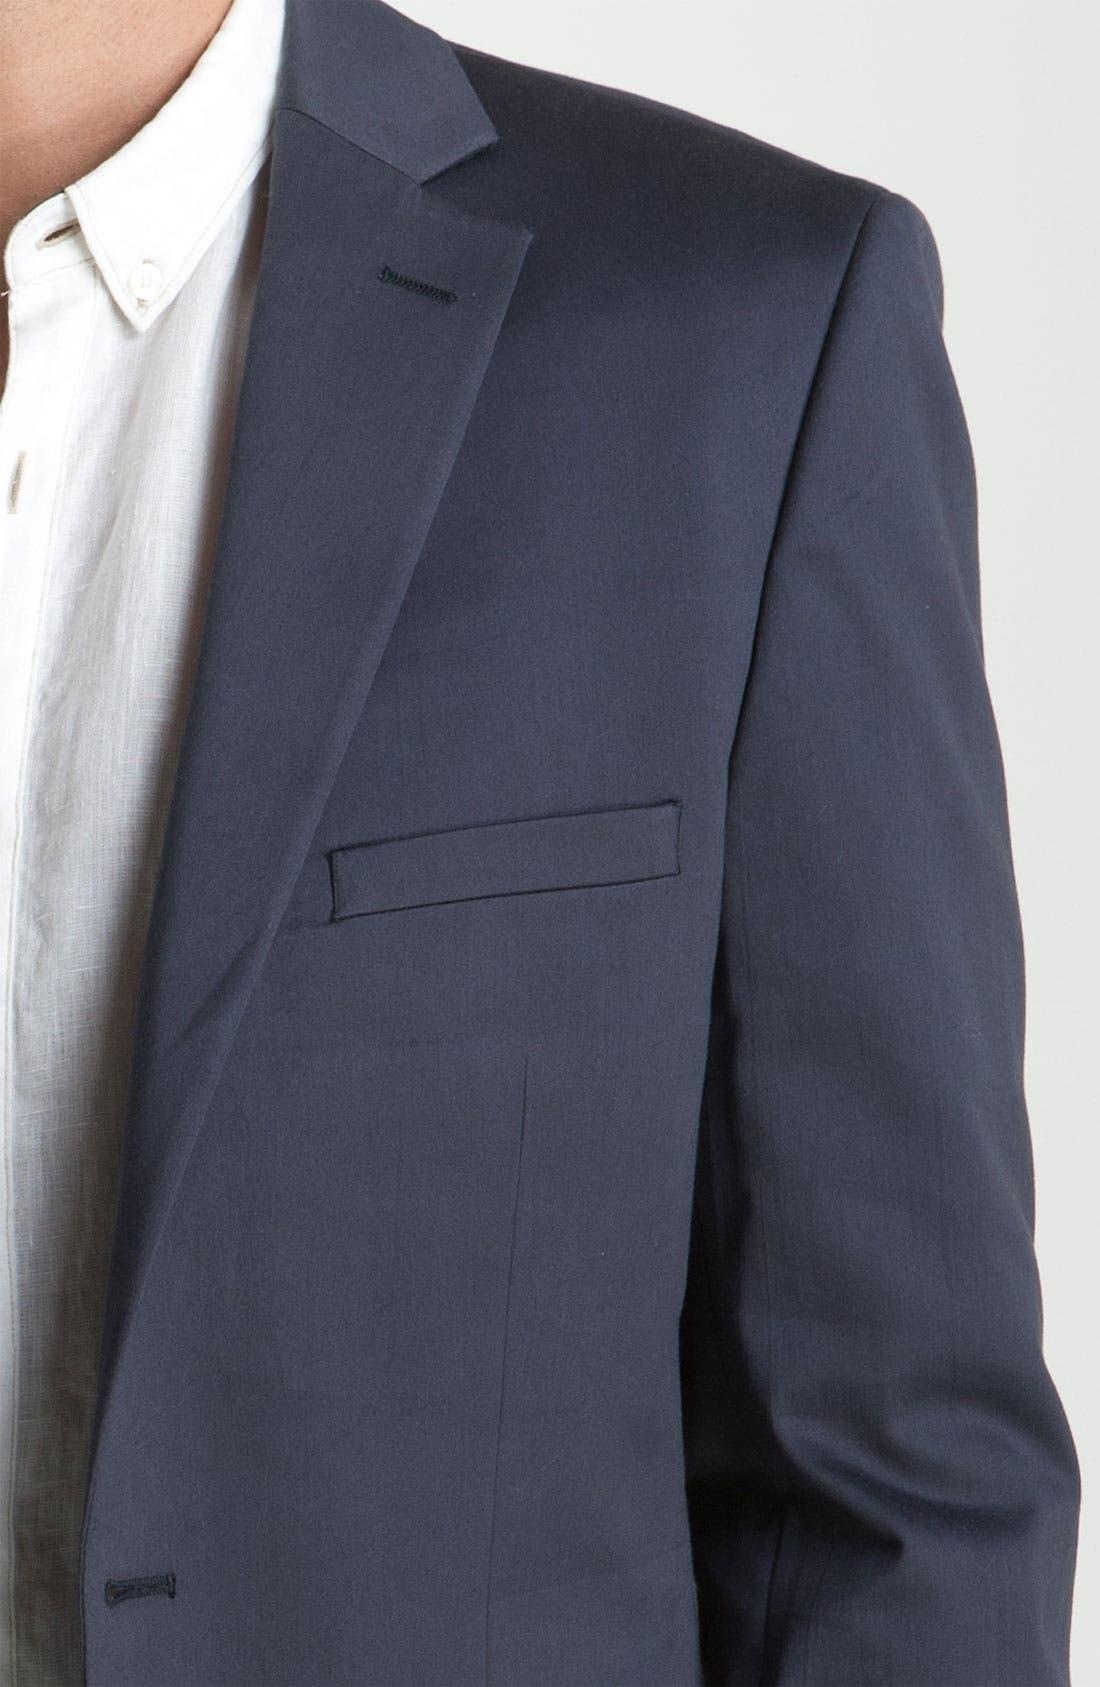 Alternate Image 3  - Calibrate Trim Fit Cotton Sportcoat